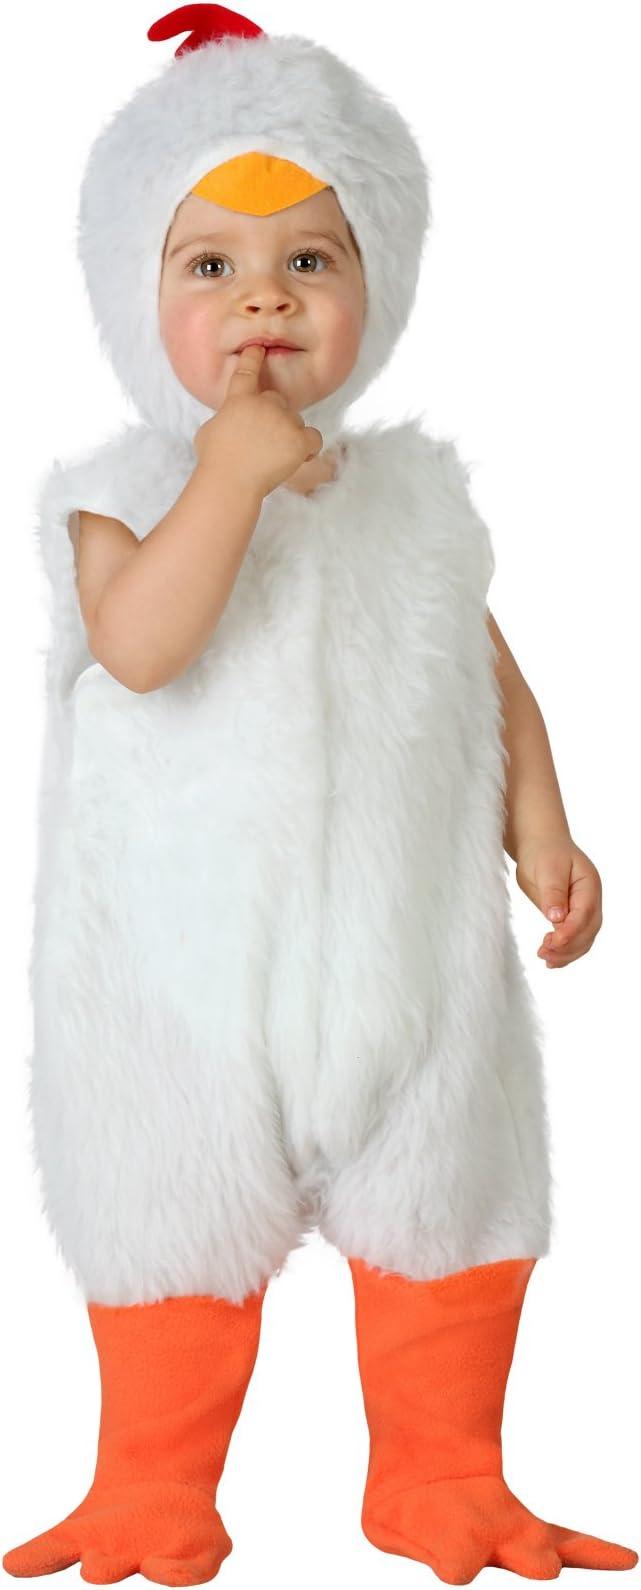 Atosa-23767 Disfraz de Gallina, Bebe T, color blanco, 0 a 6 meses ...